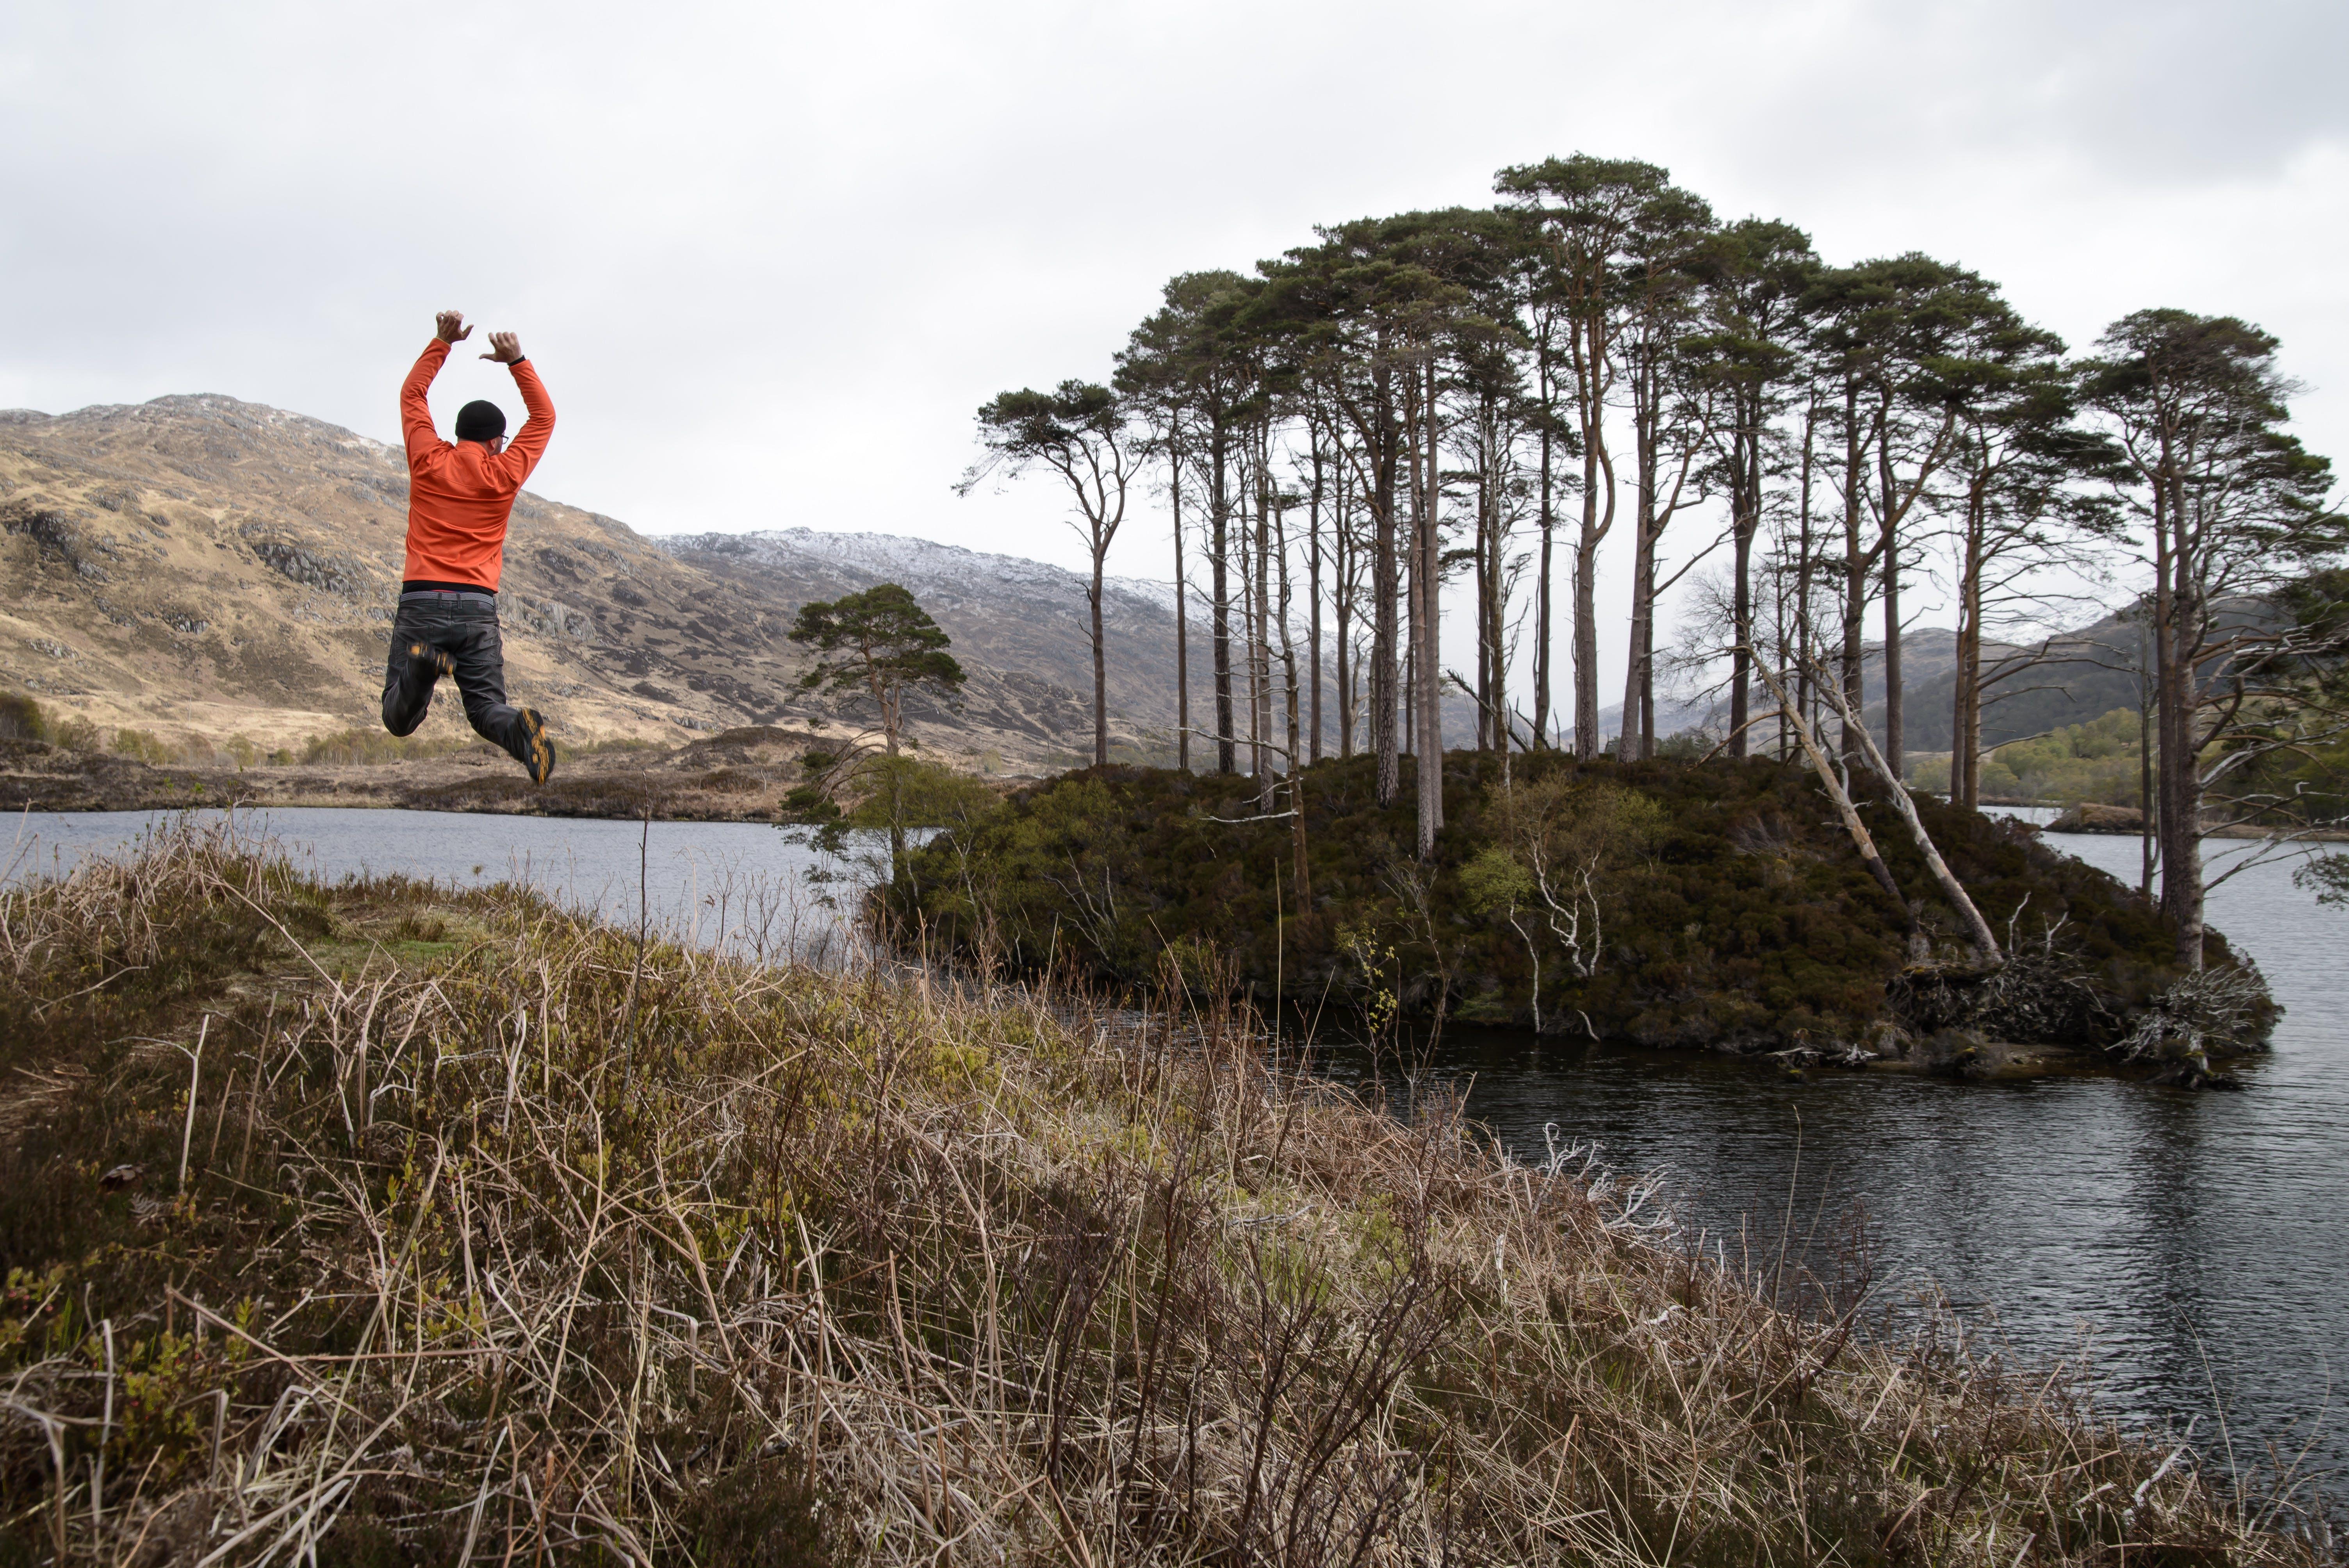 Man in Orange Long-sleeved Shirt Jumping on Lake Near Tall Trees at Daytime